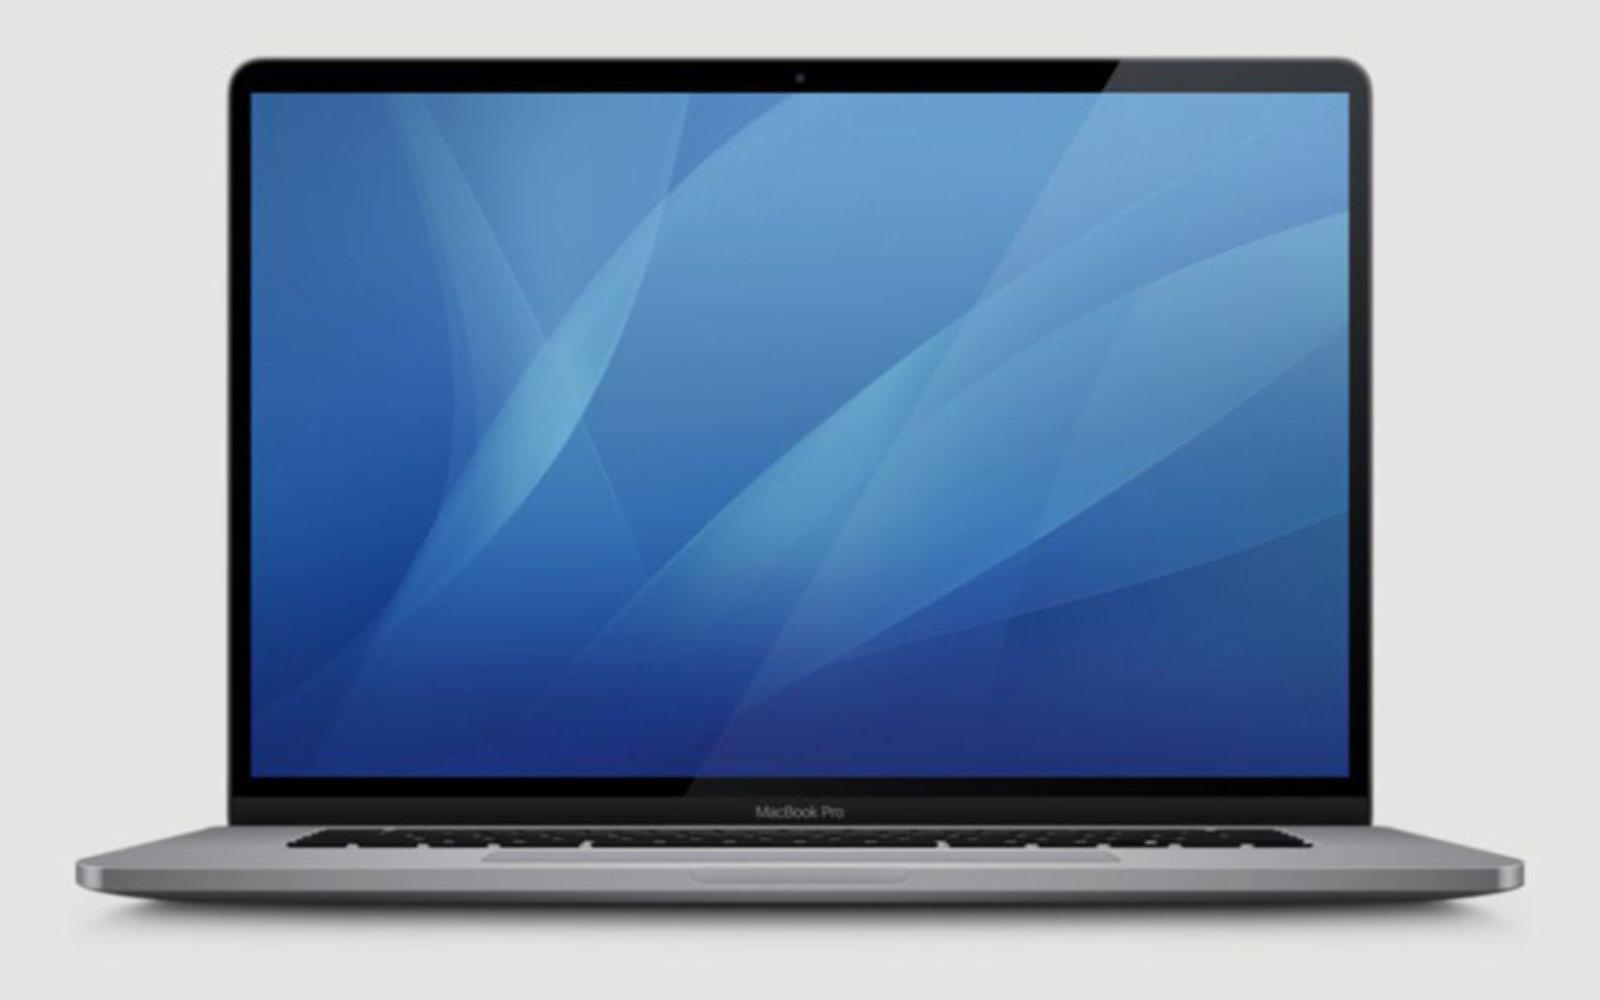 MacBook_Pro_2019_16inch-Icon.jpg